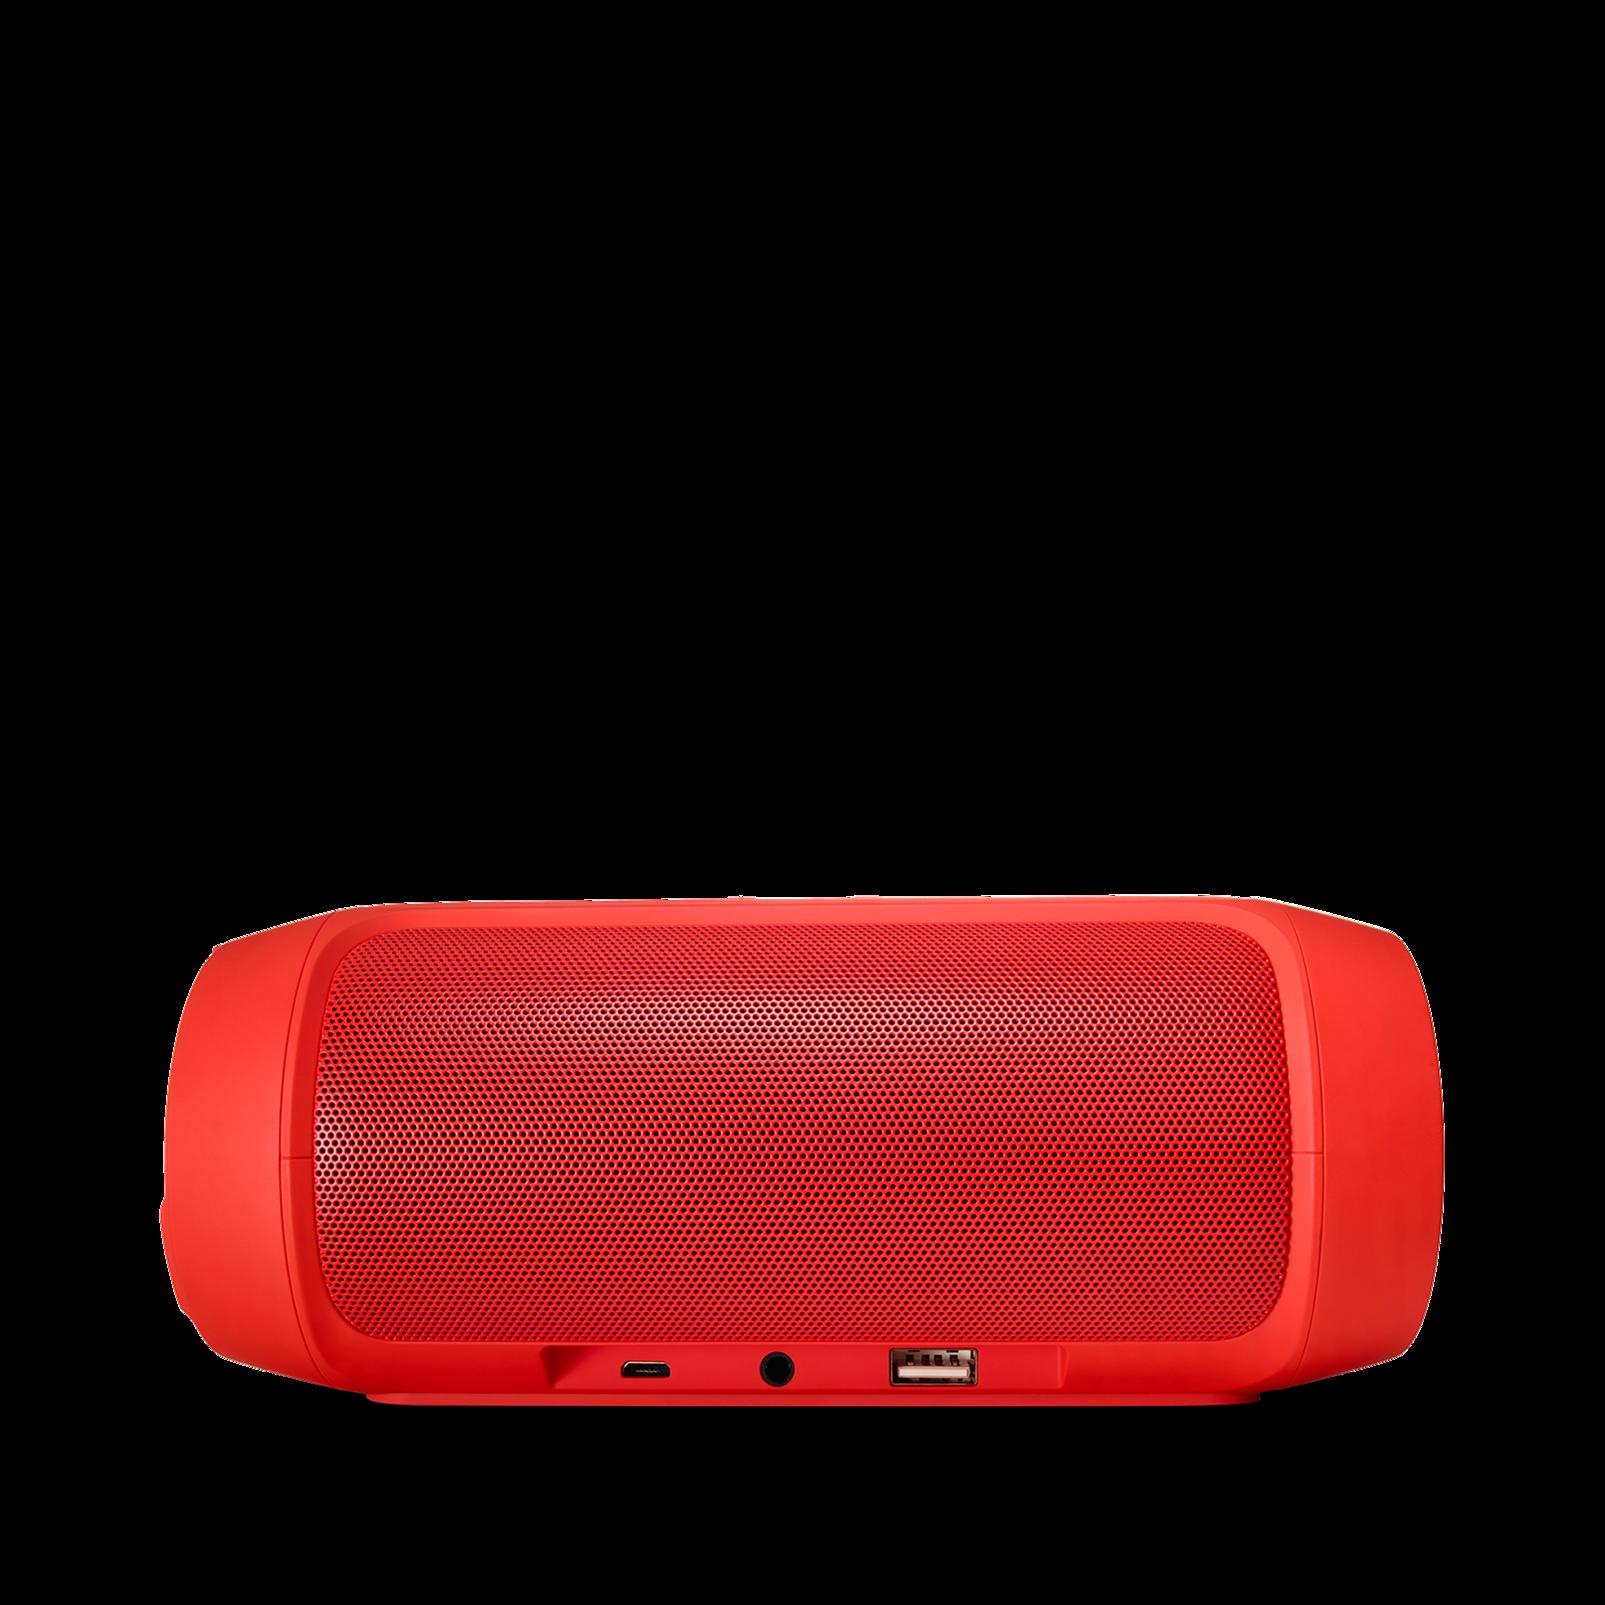 Jbl Charge 2 Splashproof Portable Bluetooth Speaker With Usb Charger Flip Merah